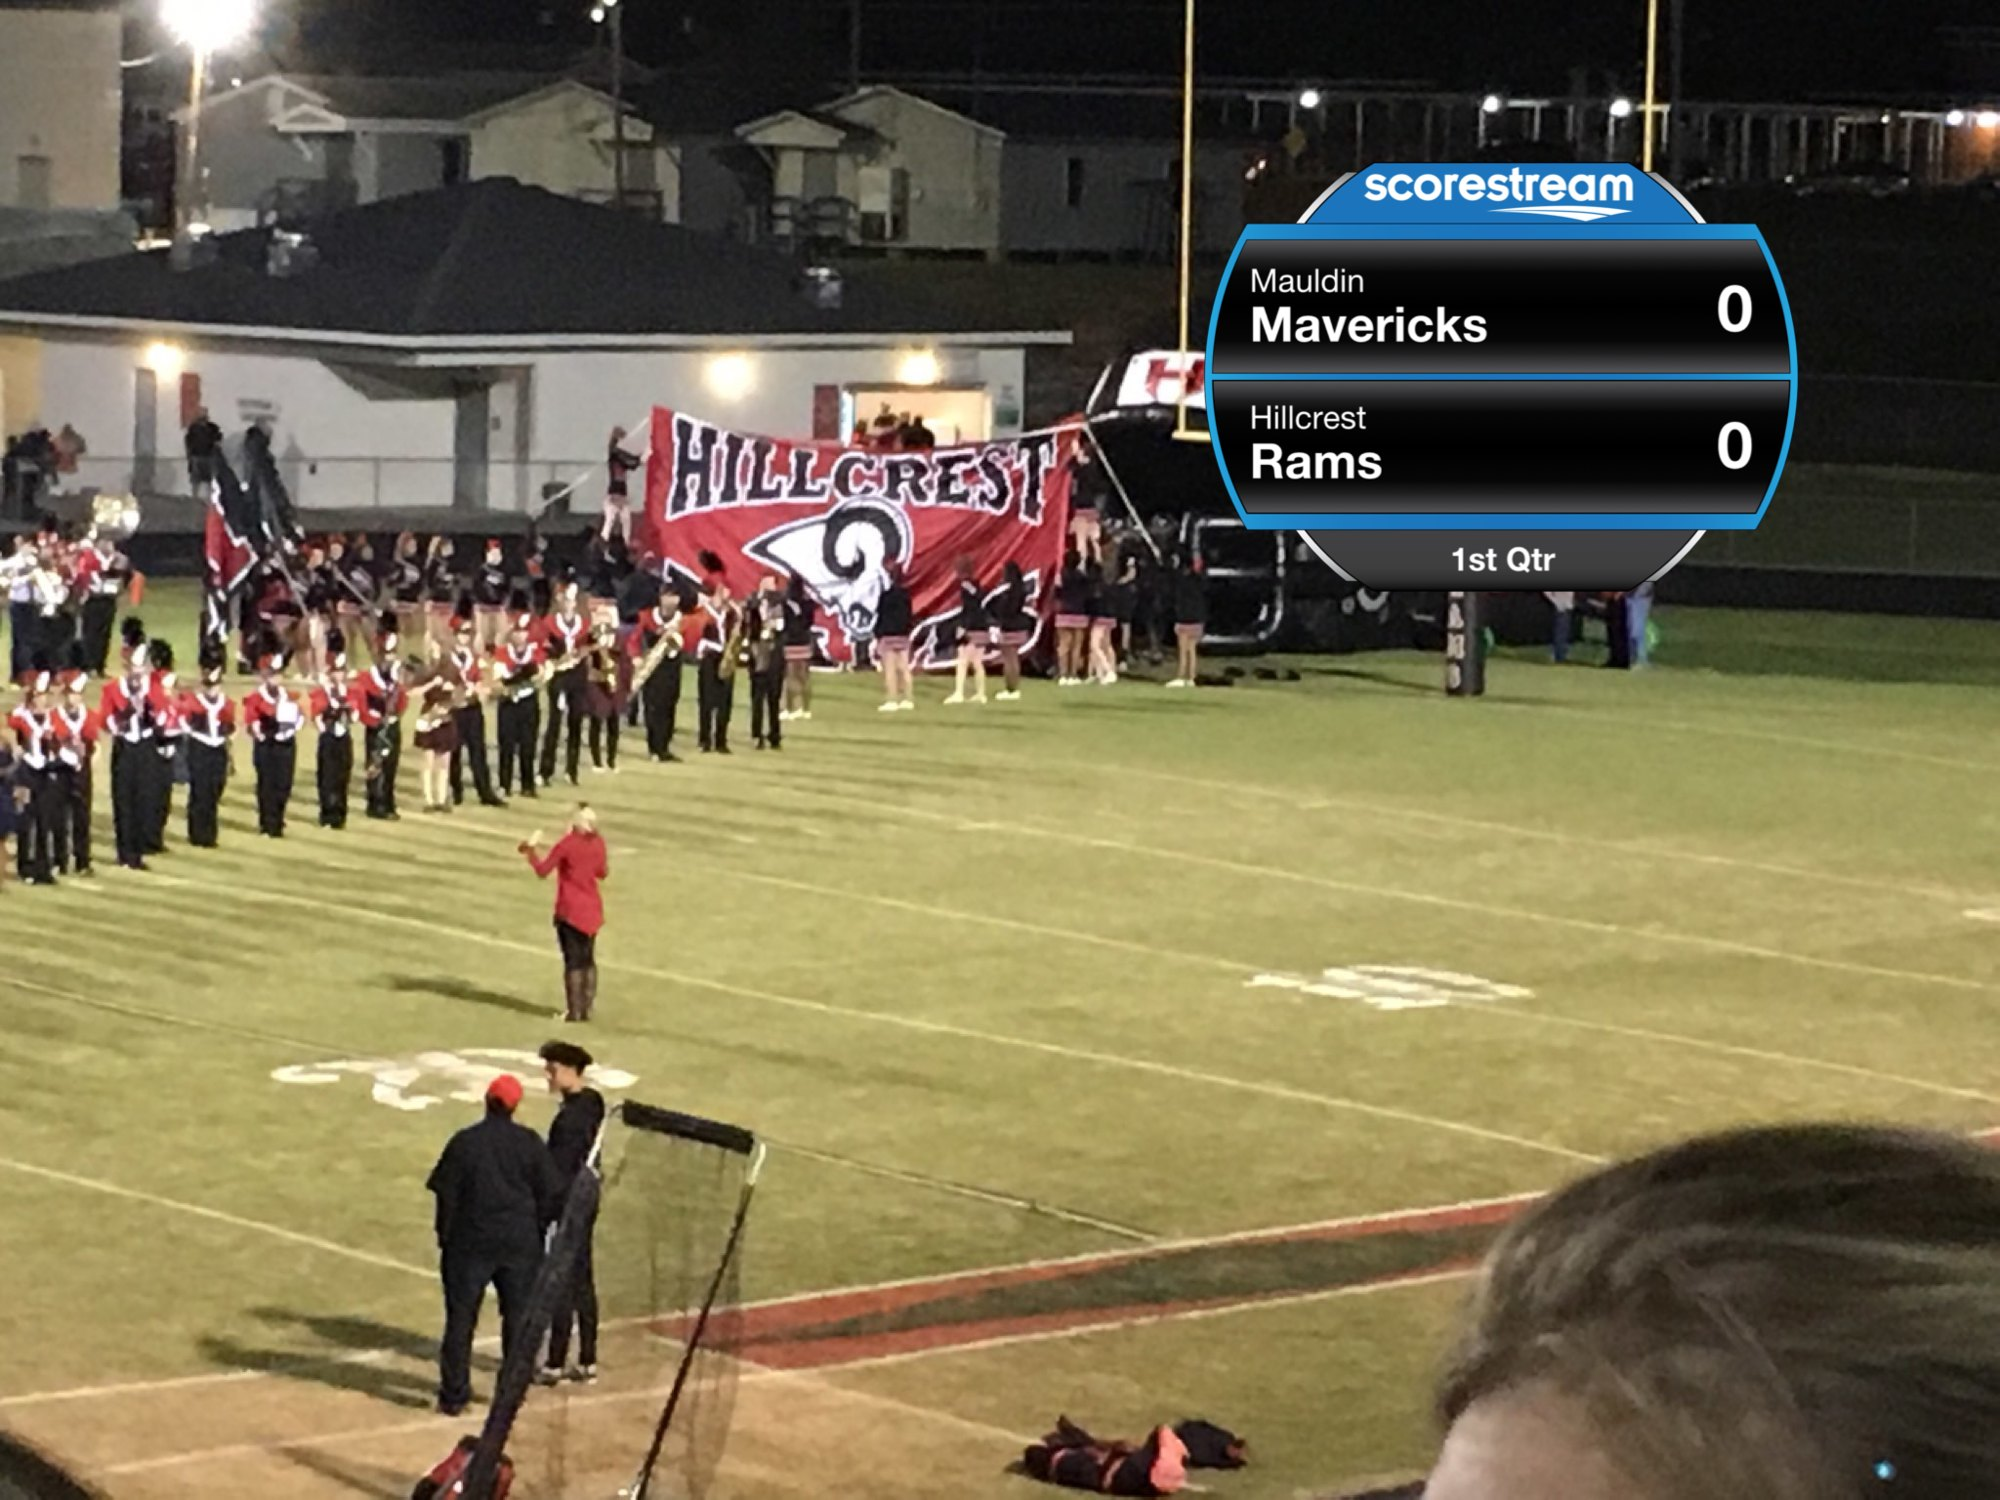 the mauldin mavericks vs the hillcrest rams scorestream